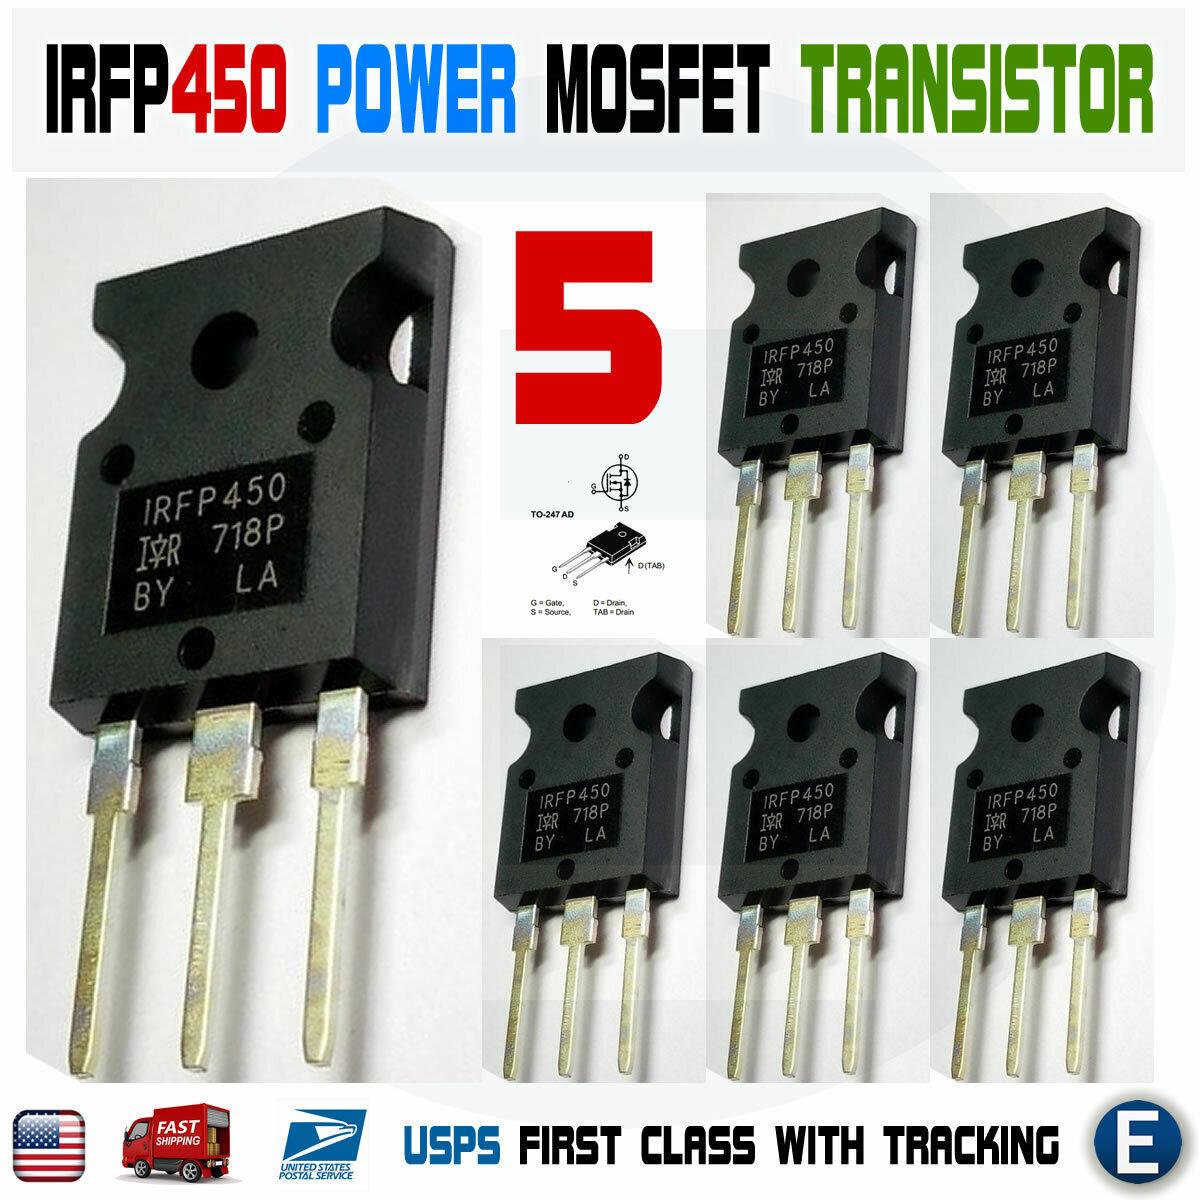 Transistor IRFP450 Megabite Electronics Lot of 2 Plastic Enclosure